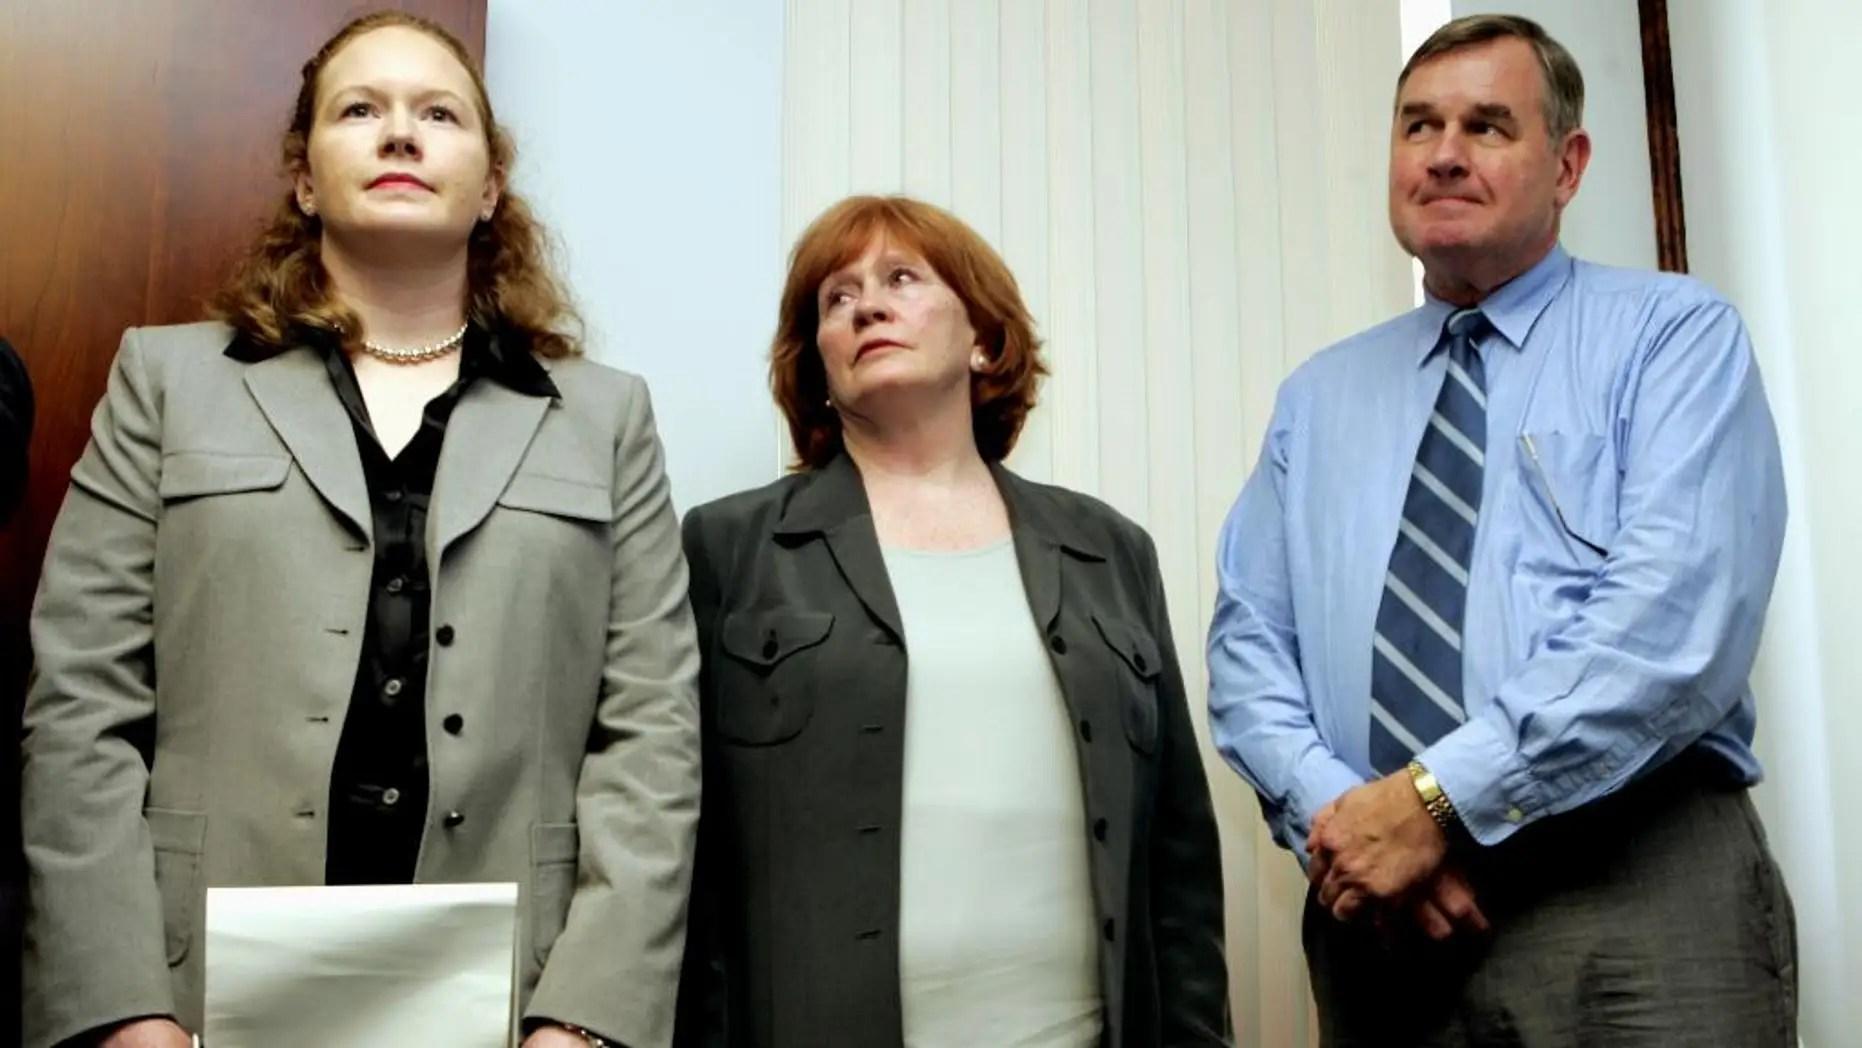 Lawyer Fbi Ends Investigation Of Connecticut Man'